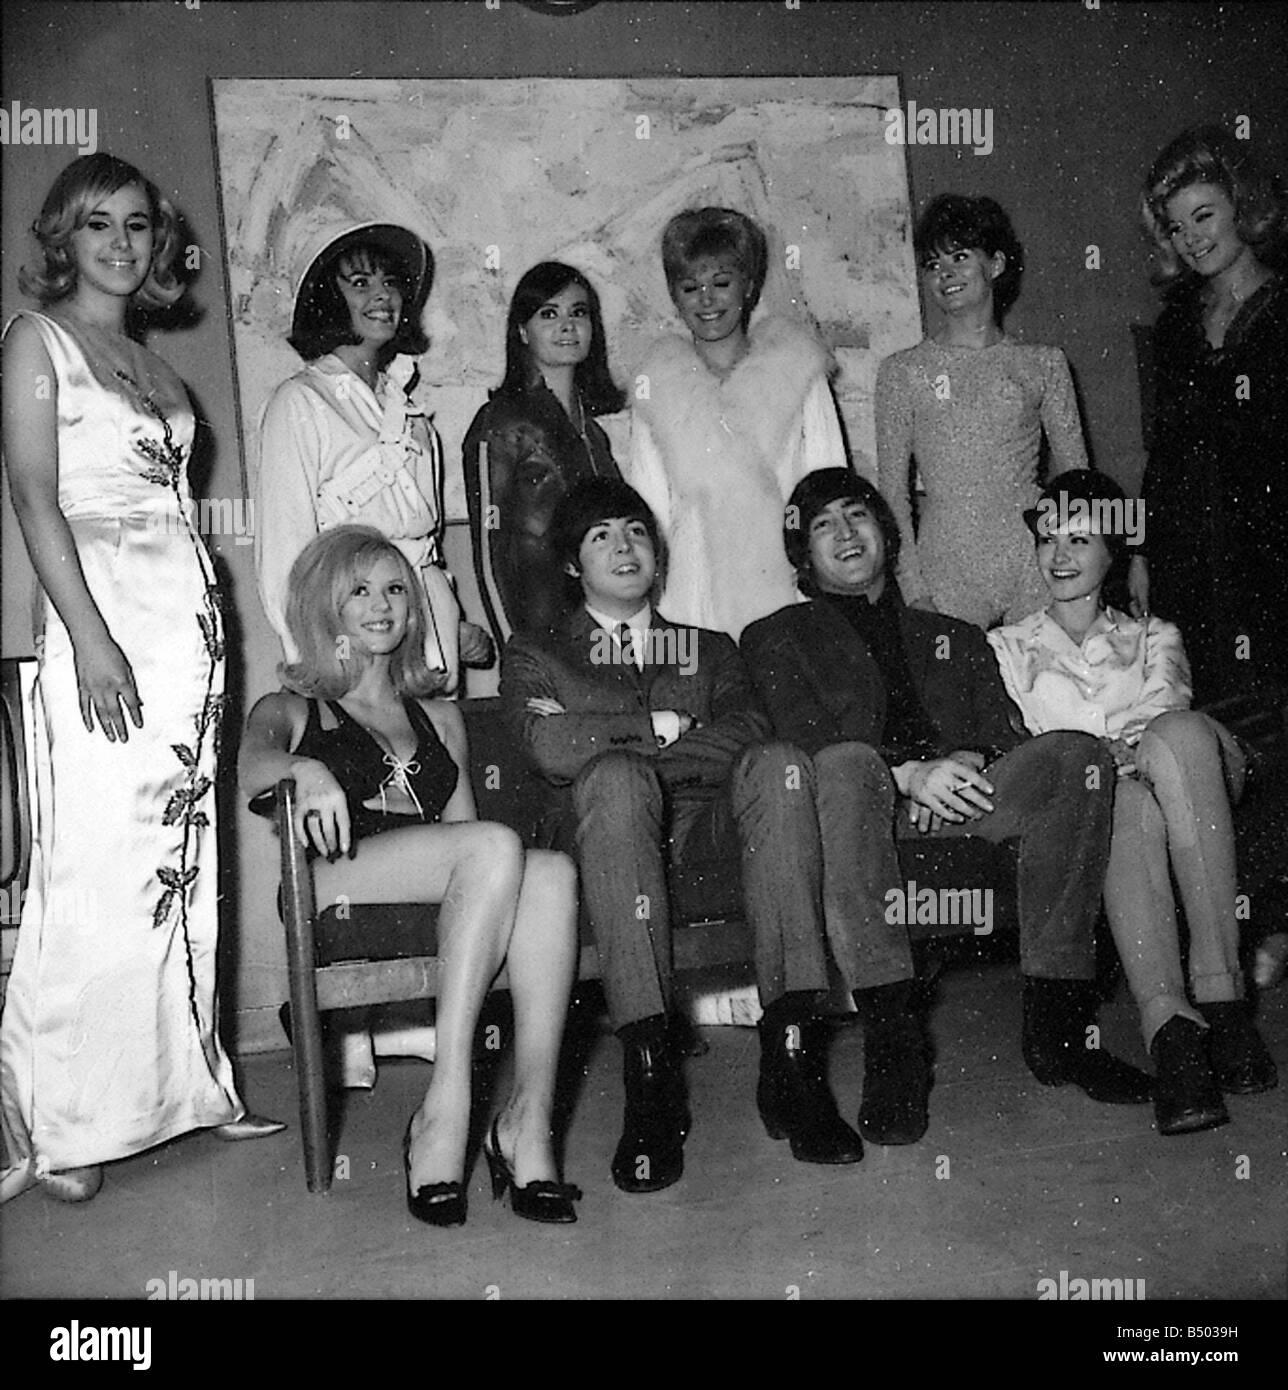 Designer Tv Shows Beatles Files 1965 John Paul Backstage With Show Girls